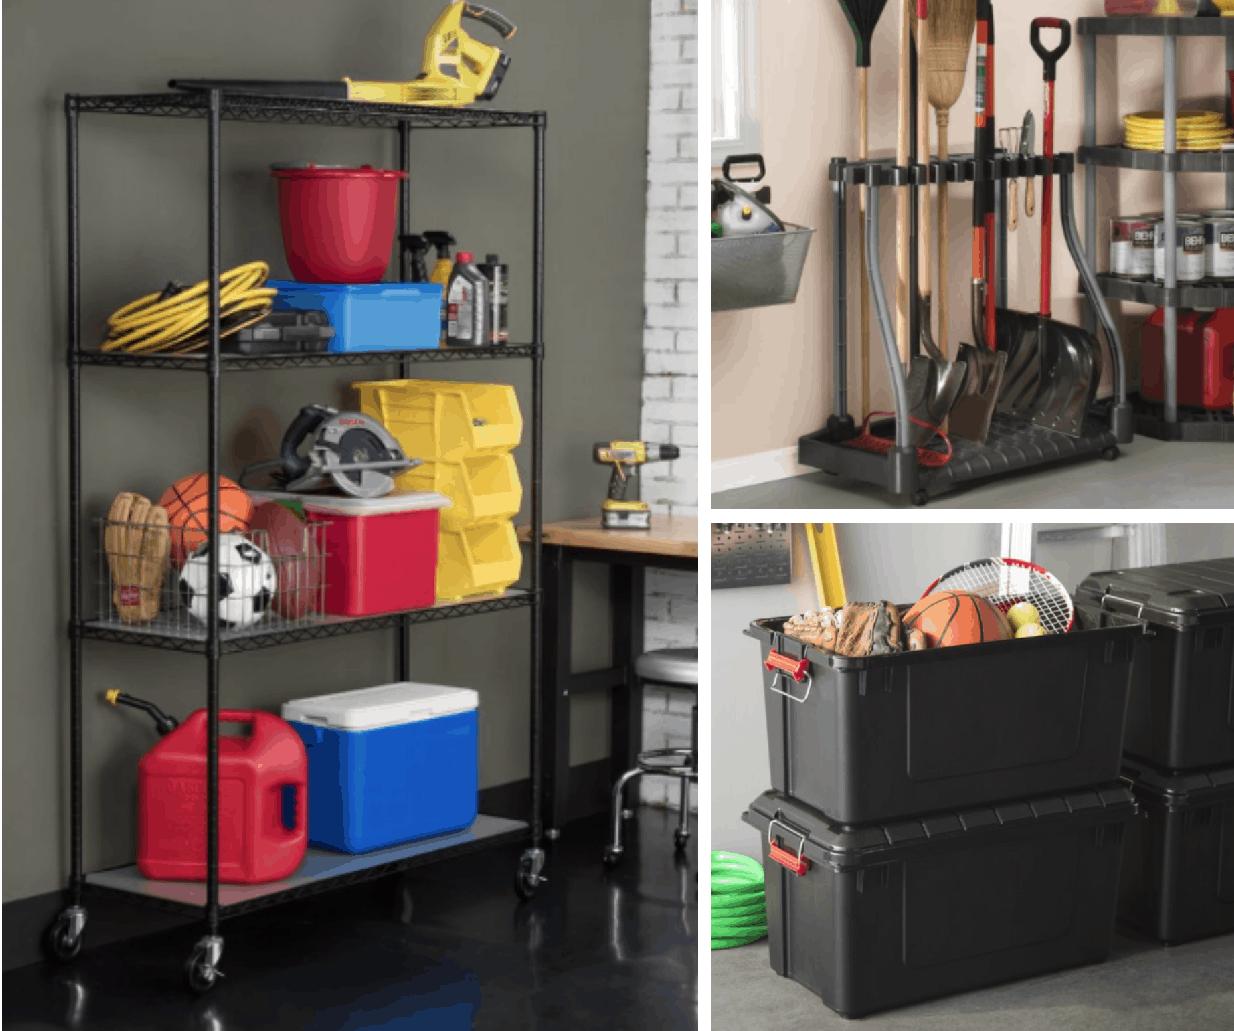 Garage Storage Items Up to 70% Off at Wayfair!